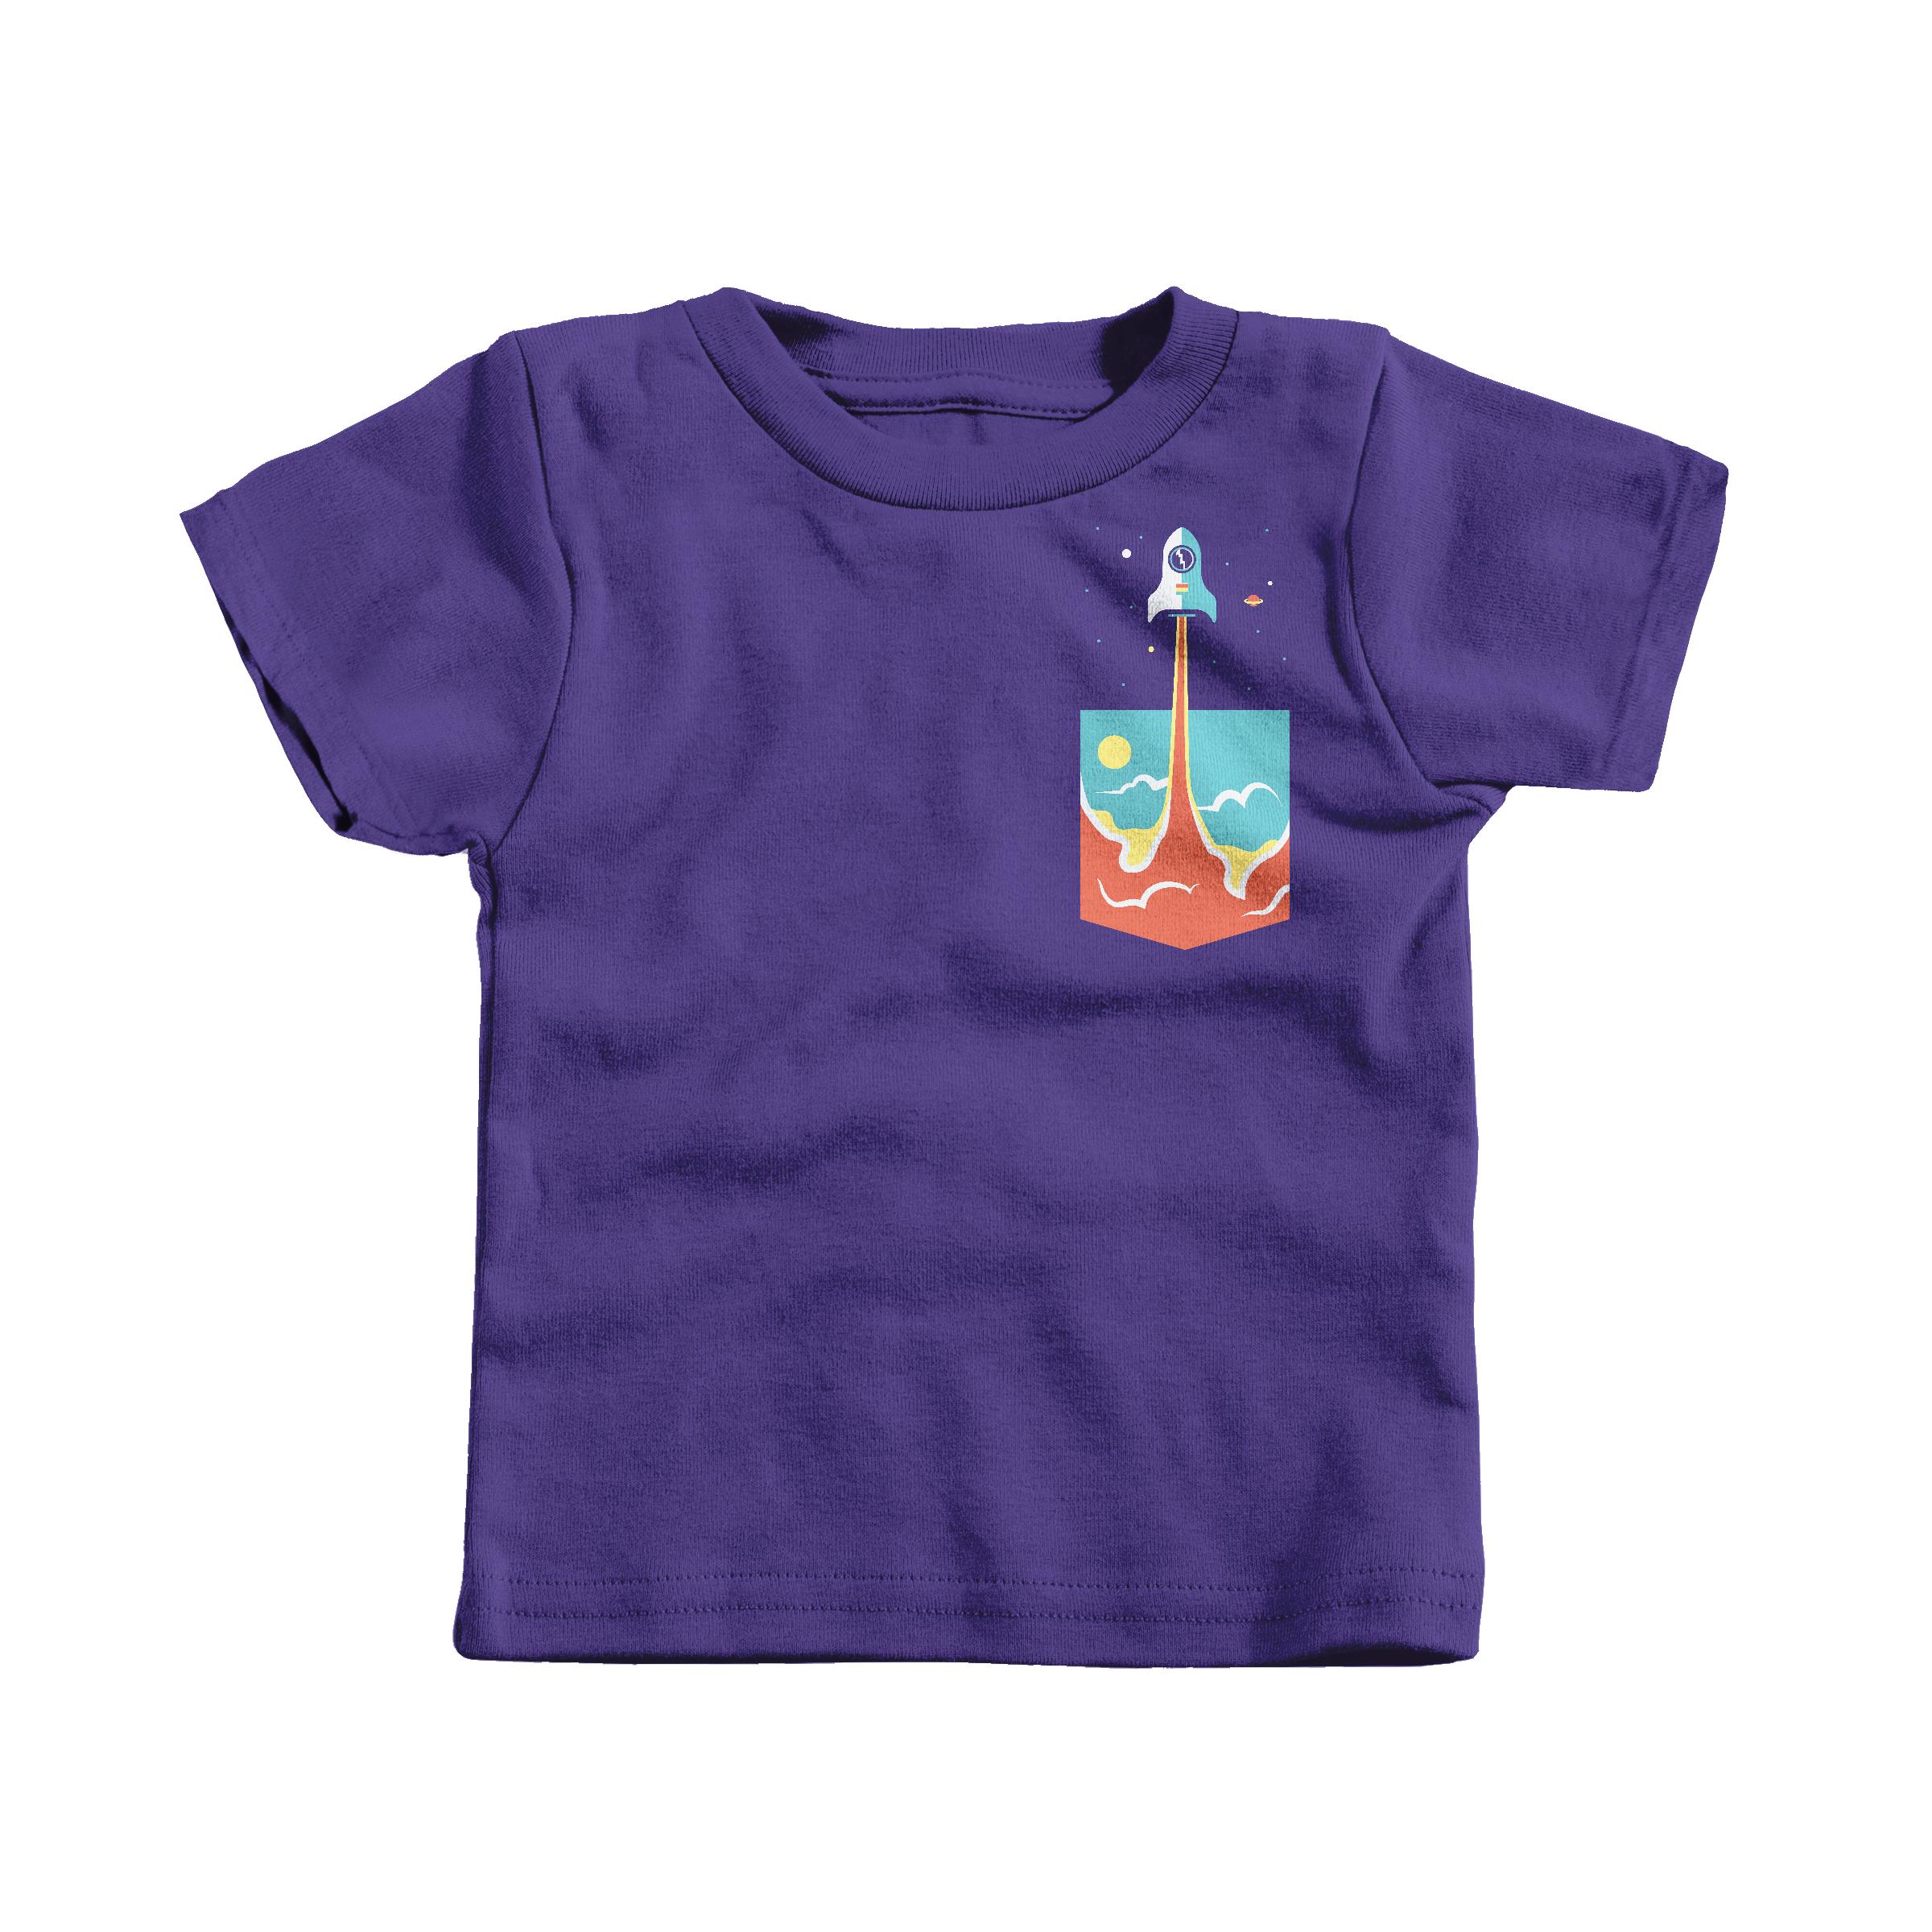 Pocket Rocket Purple (T-Shirt)